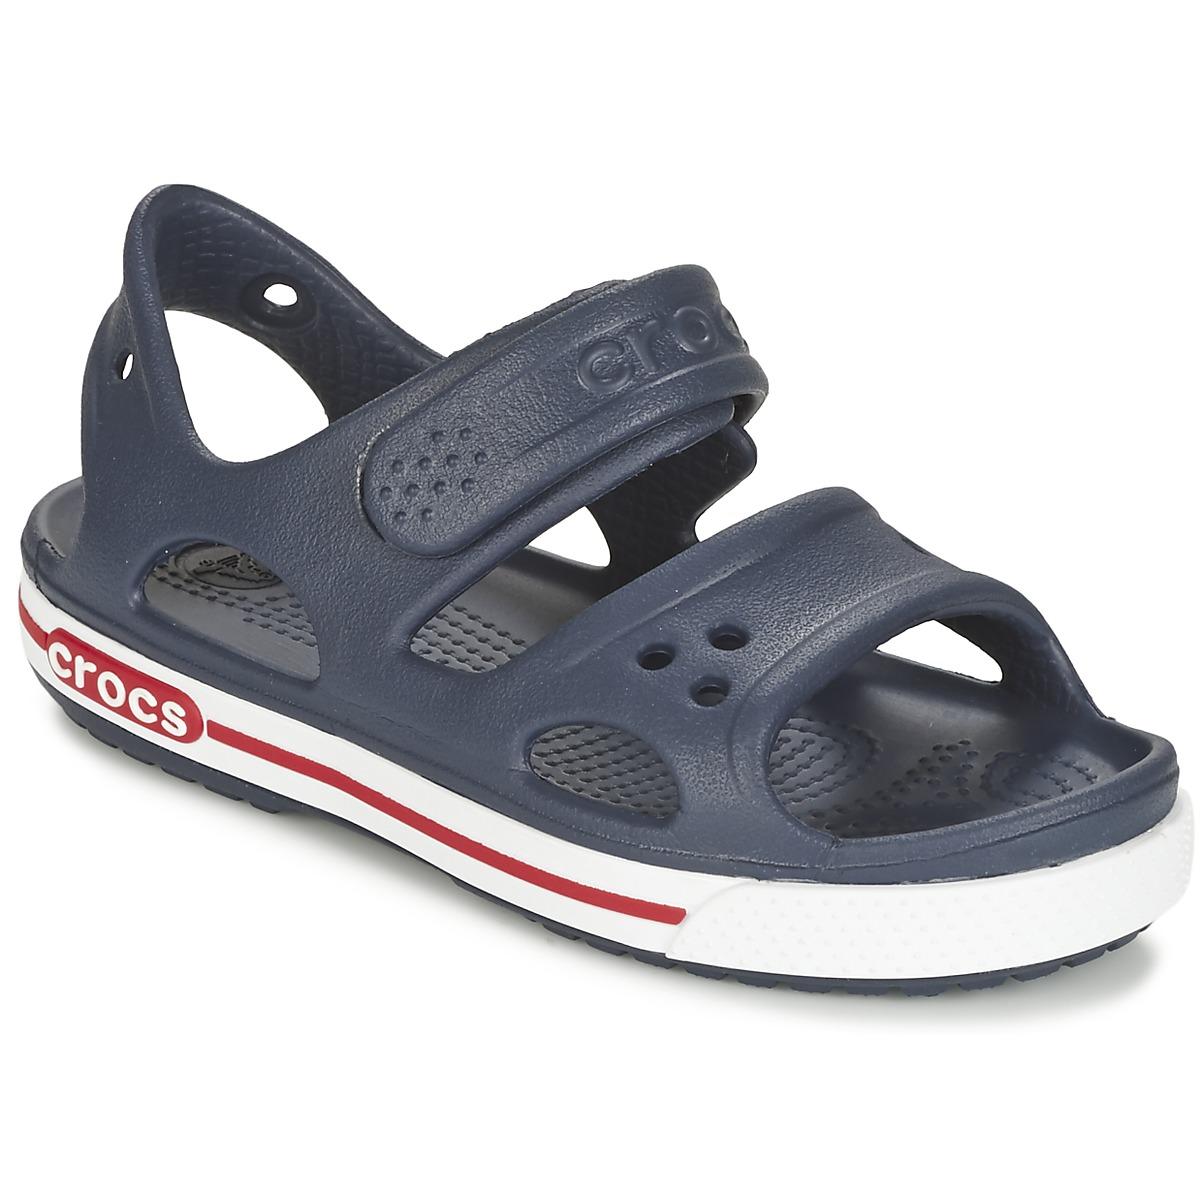 Sandale Crocs CROCBAND II SANDAL PS Marine / Blanc